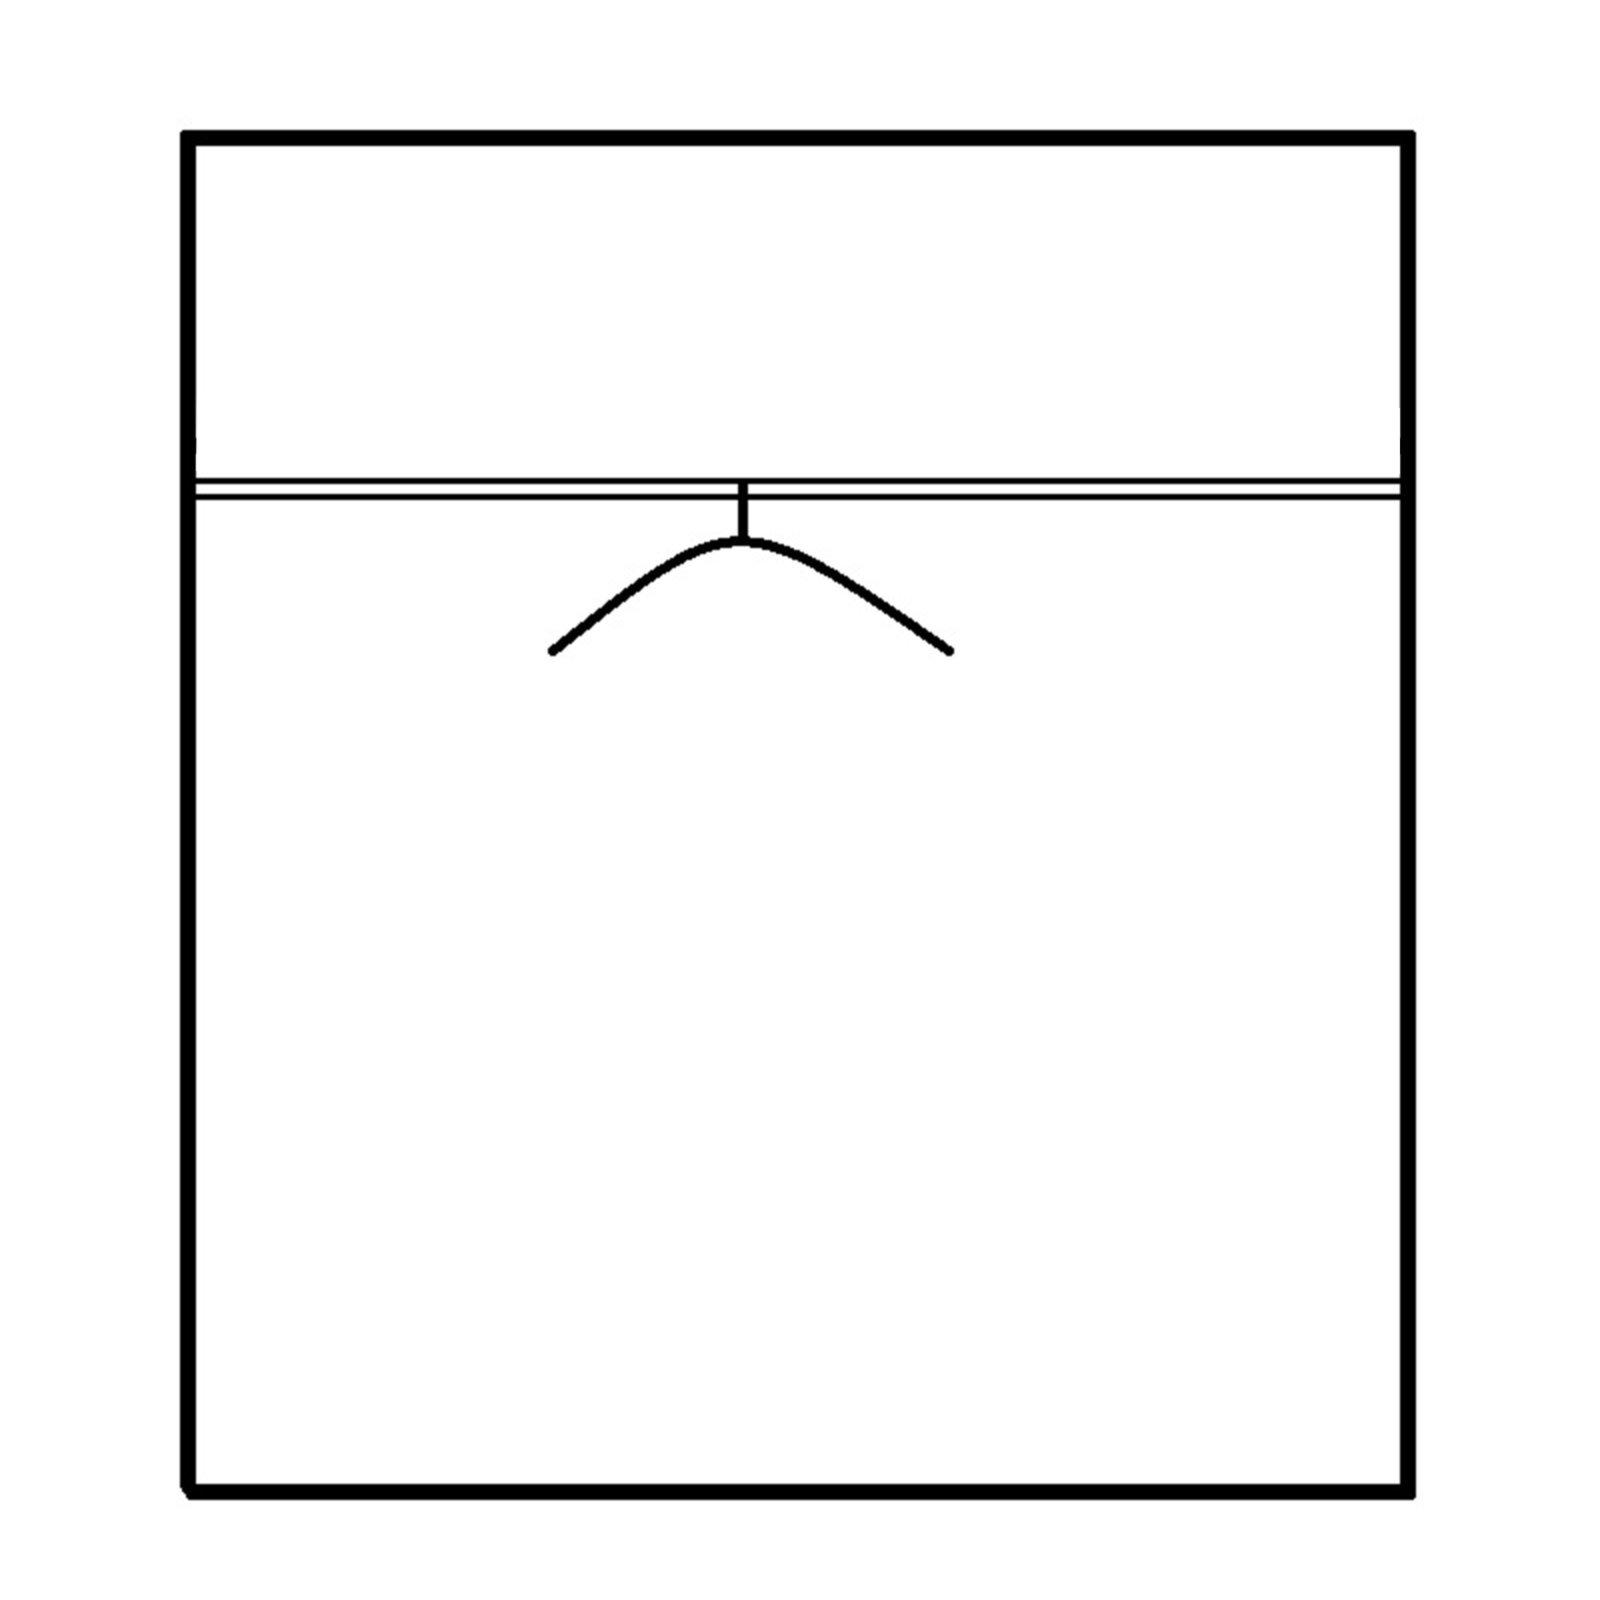 stoffschrank fancy blau ebay. Black Bedroom Furniture Sets. Home Design Ideas